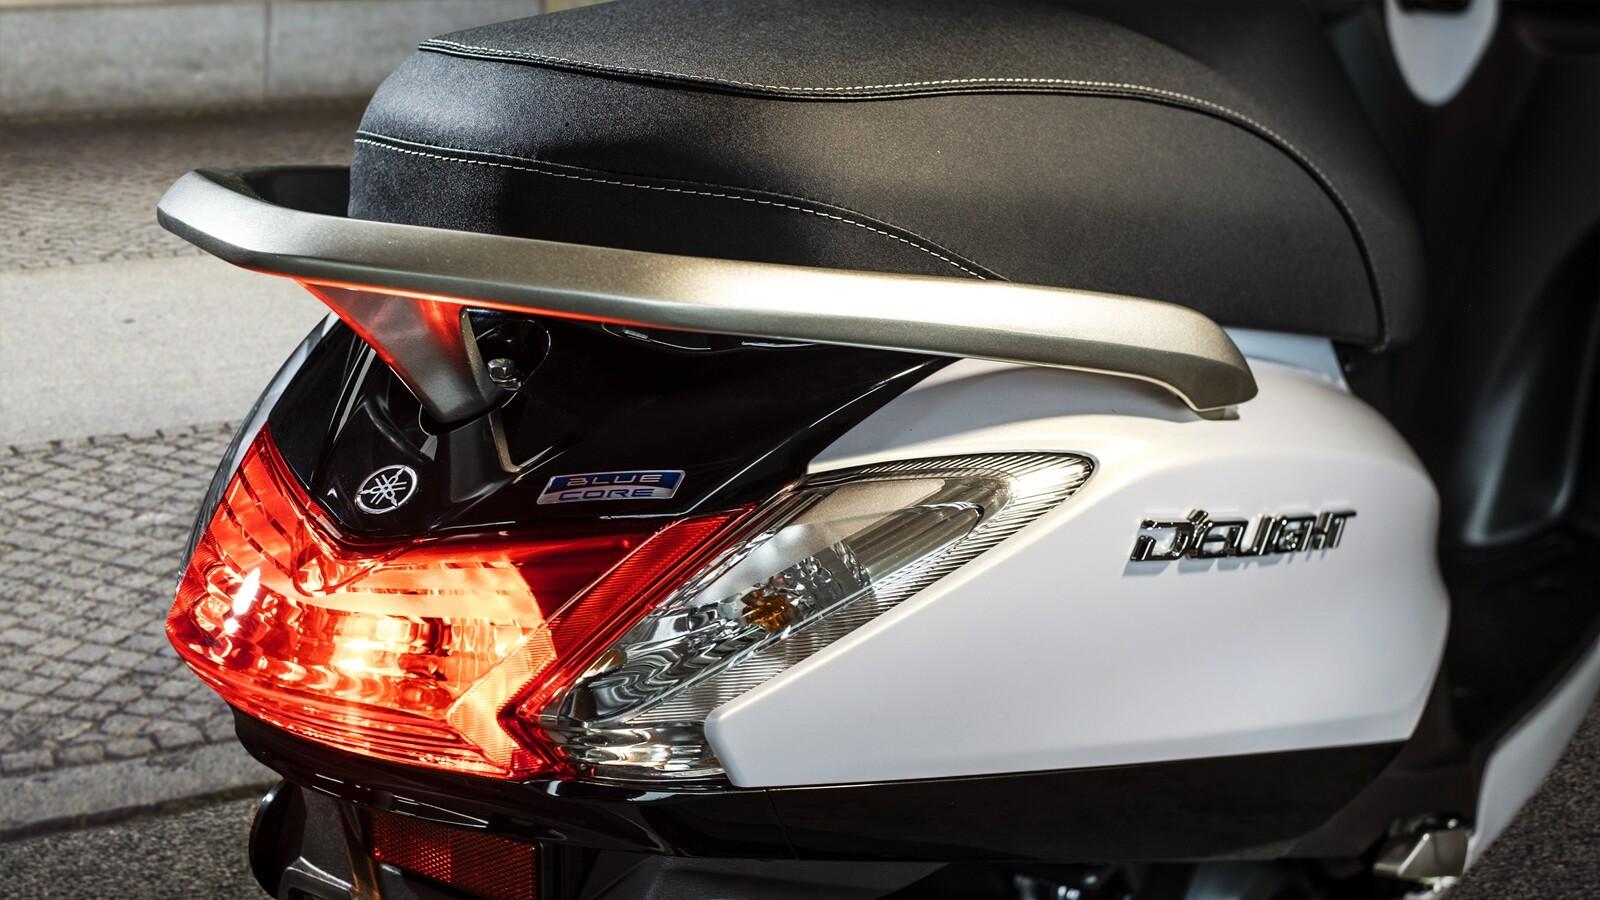 Yamaha D'elight 125 2021, prueba